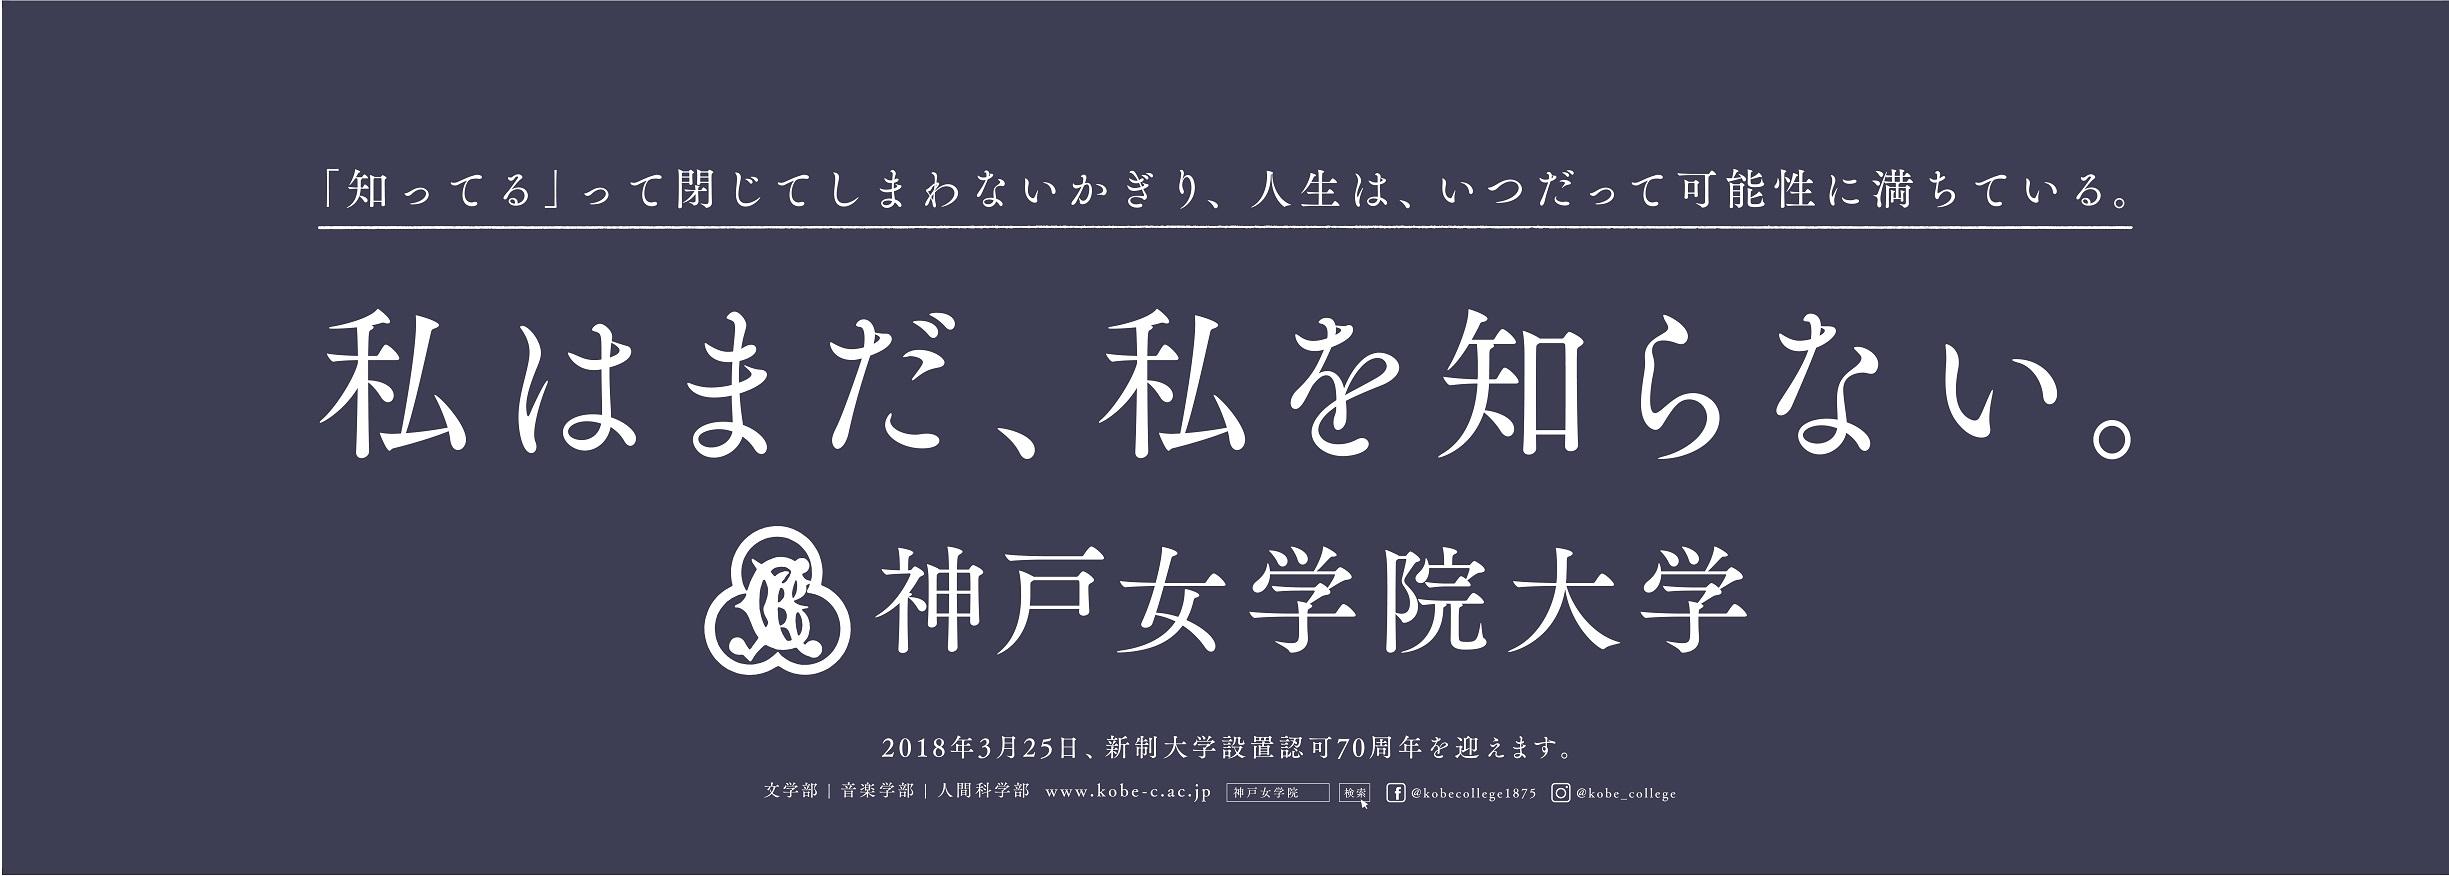 2018年3月広告-2